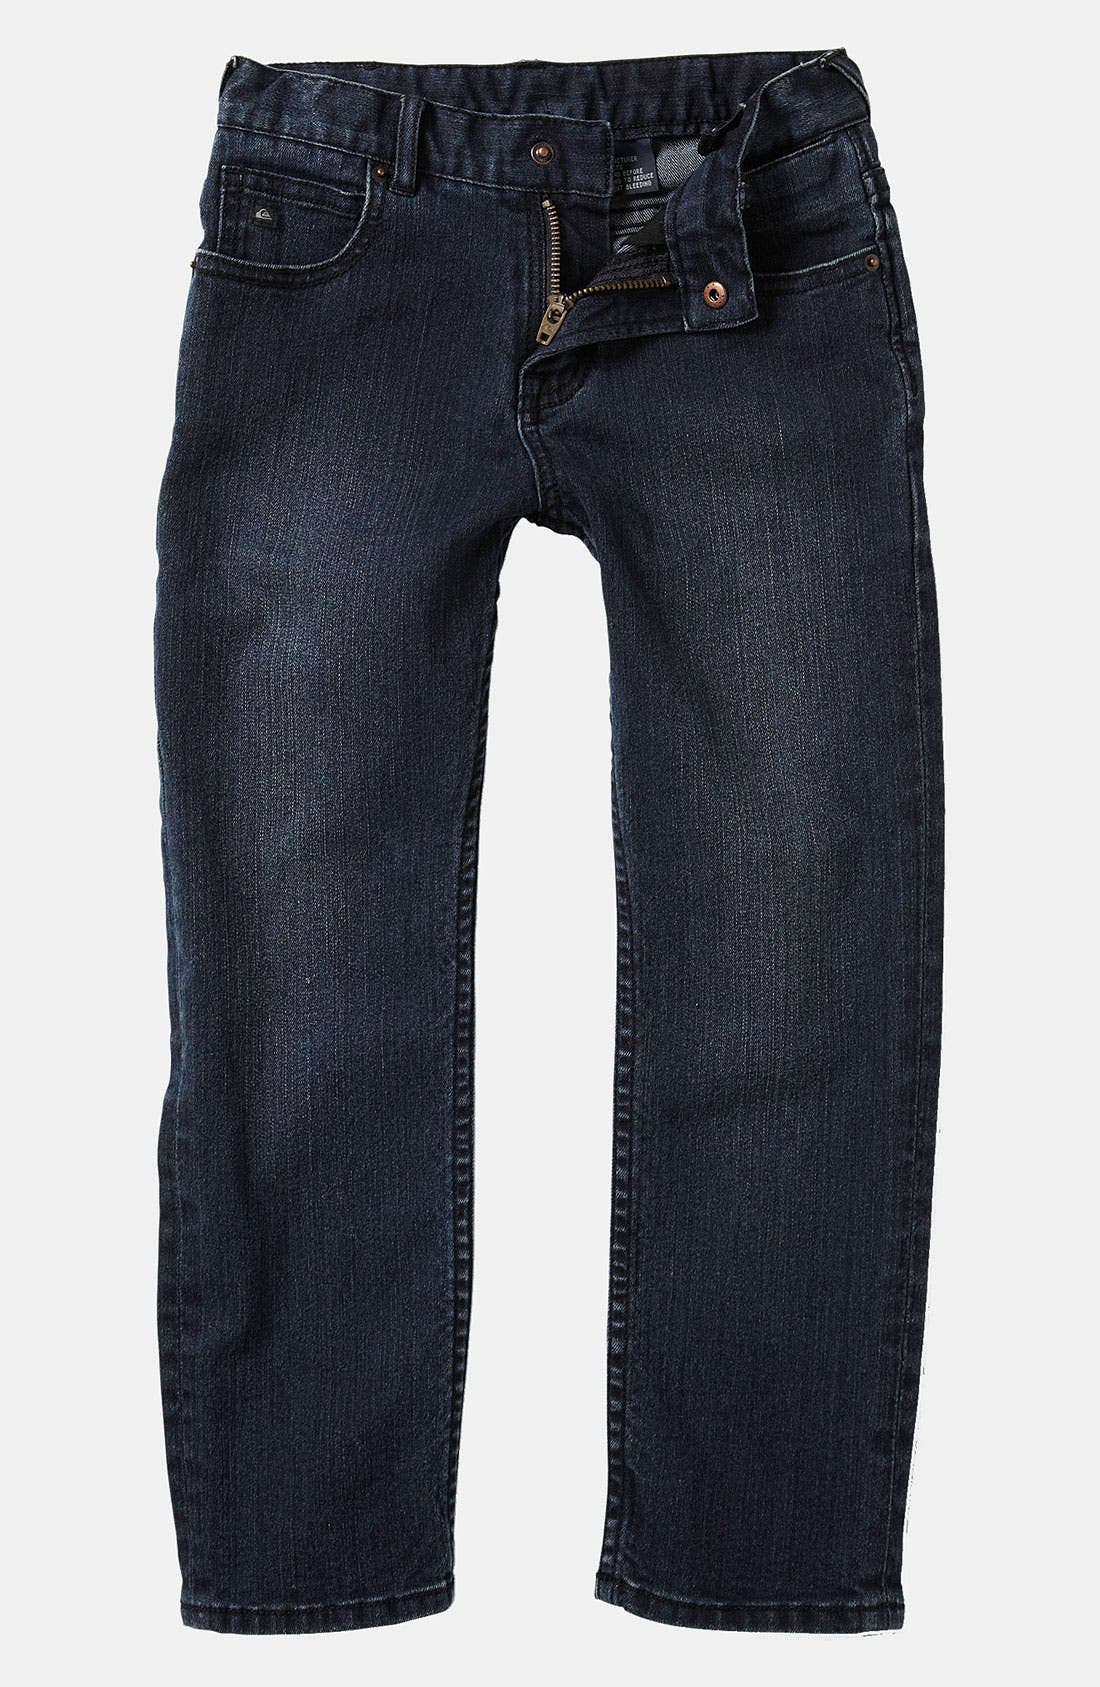 Alternate Image 2  - Quiksilver 'Distortion' Jeans (Toddler)